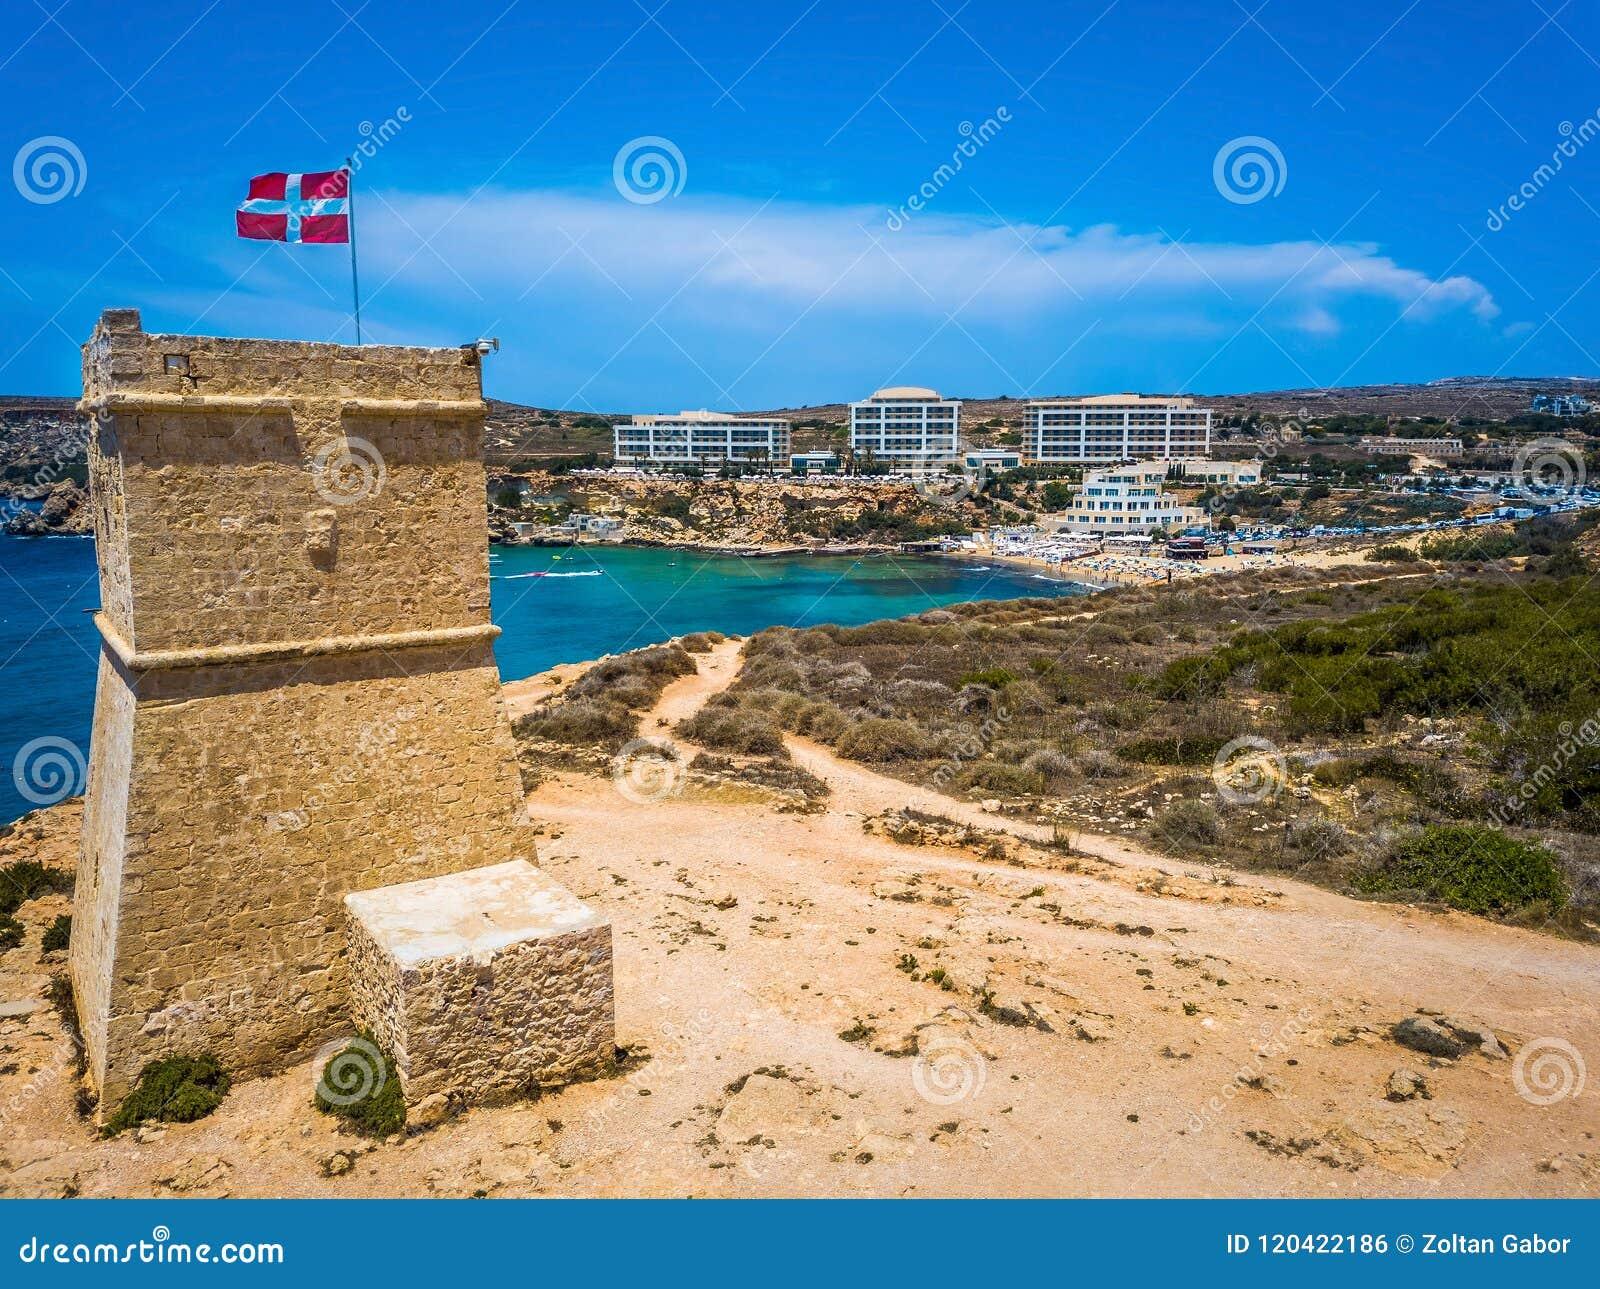 Ghajn Tuffieha, Μάλτα - όμορφο παρατηρητήριο Ghajn Tuffieha και χρυσή παραλία κόλπων μια φωτεινή θερινή ημέρα